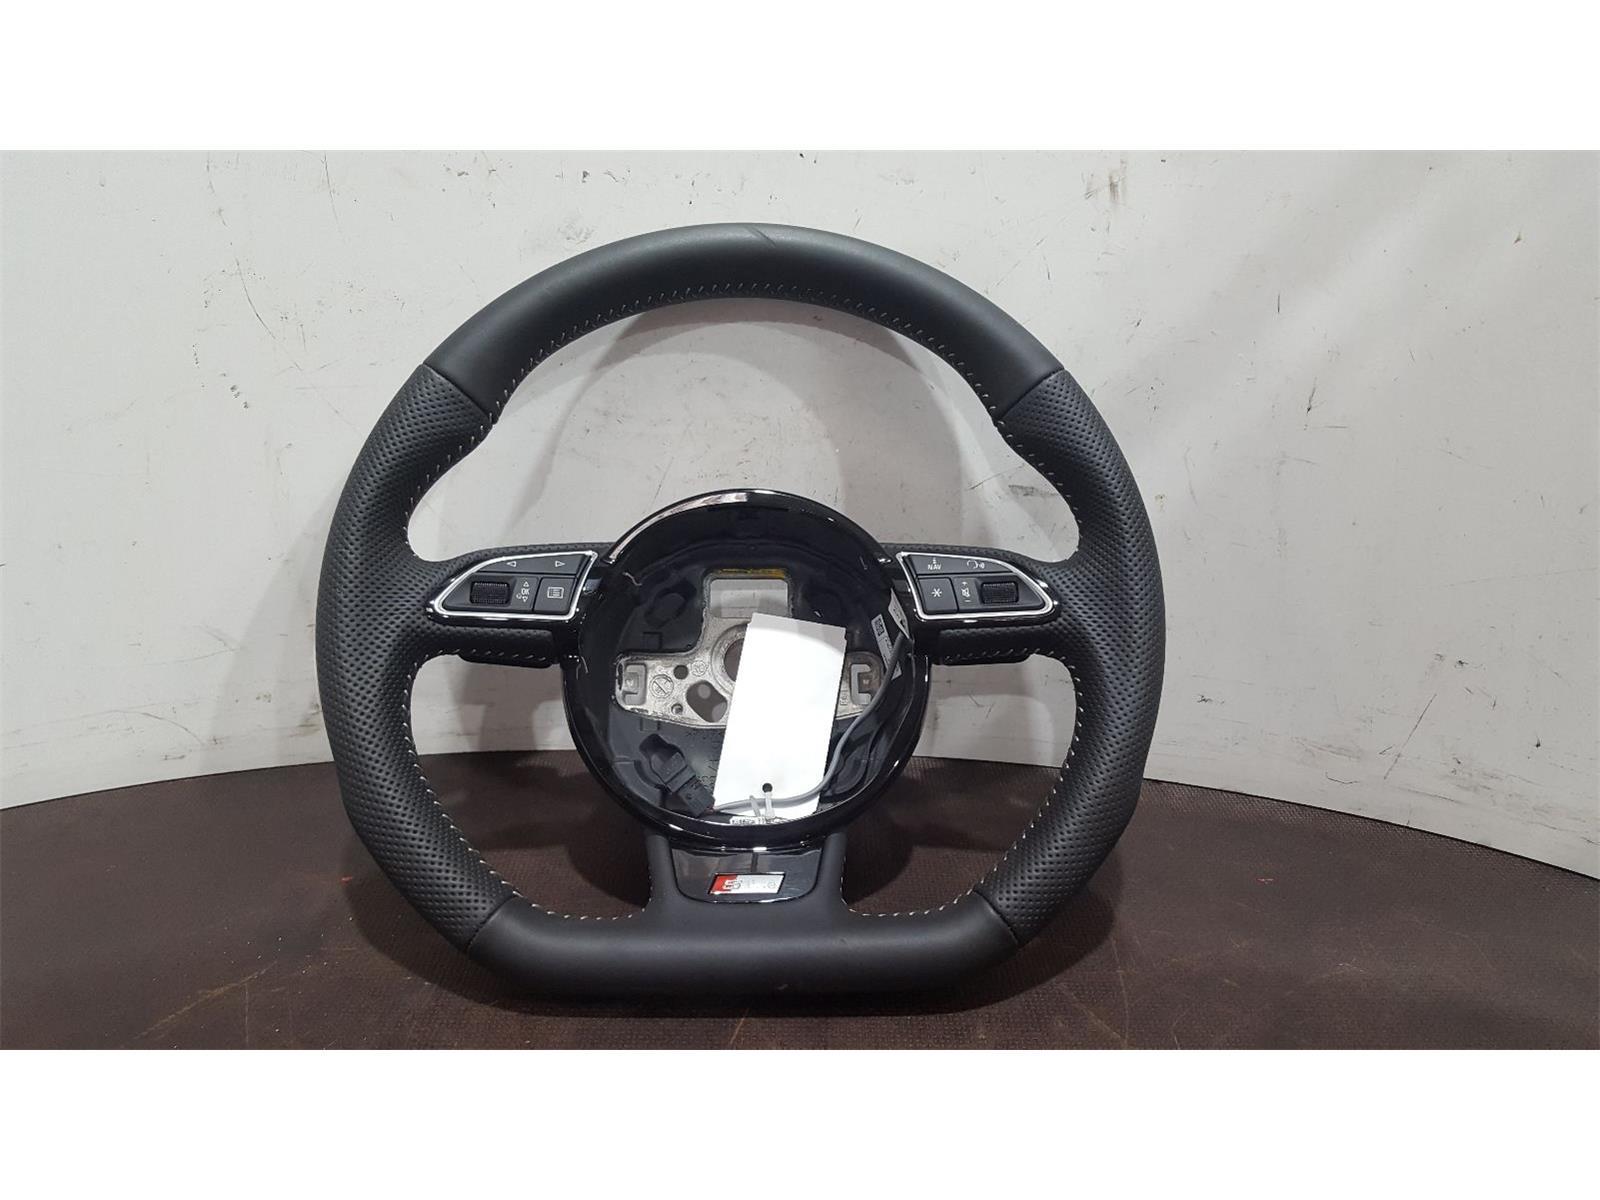 Audi A6 2014 On S Line Black Edition TFSi Steering Wheel